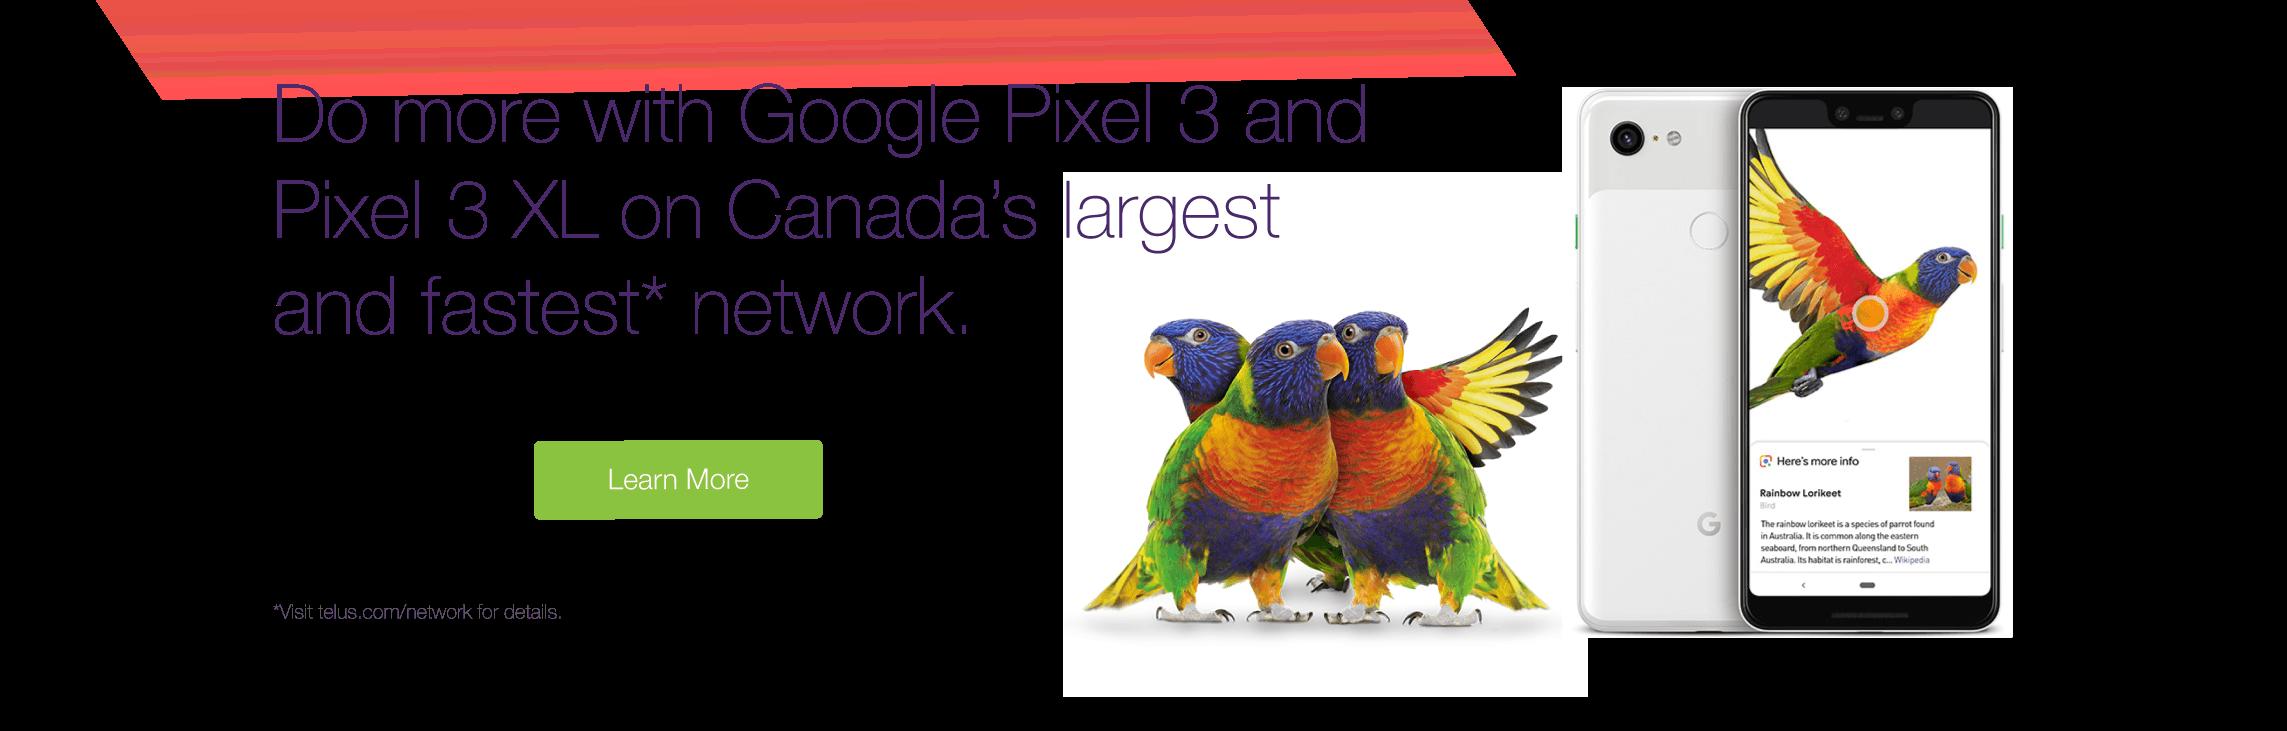 Google Pixel 3 Slide